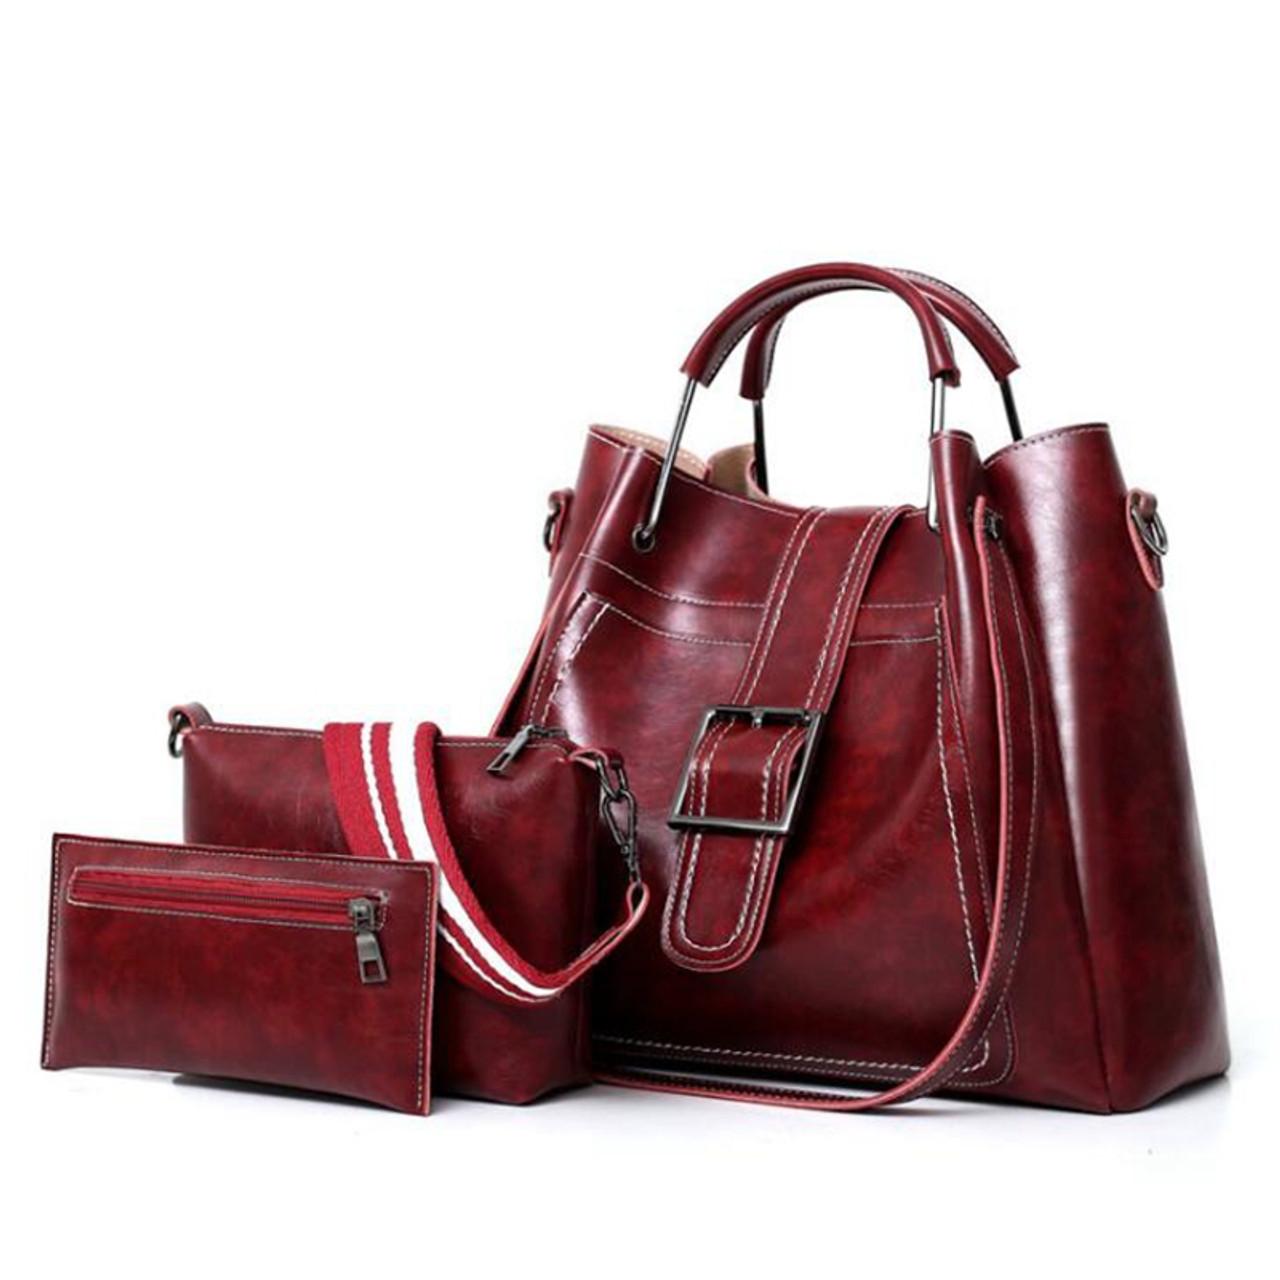 7bb4f71931c94 ... Women's Messenger Bag Women Bags Leather Luxury Handbags Famous Brands  Female Shoulder Bags Designer Crossbody Bags ...